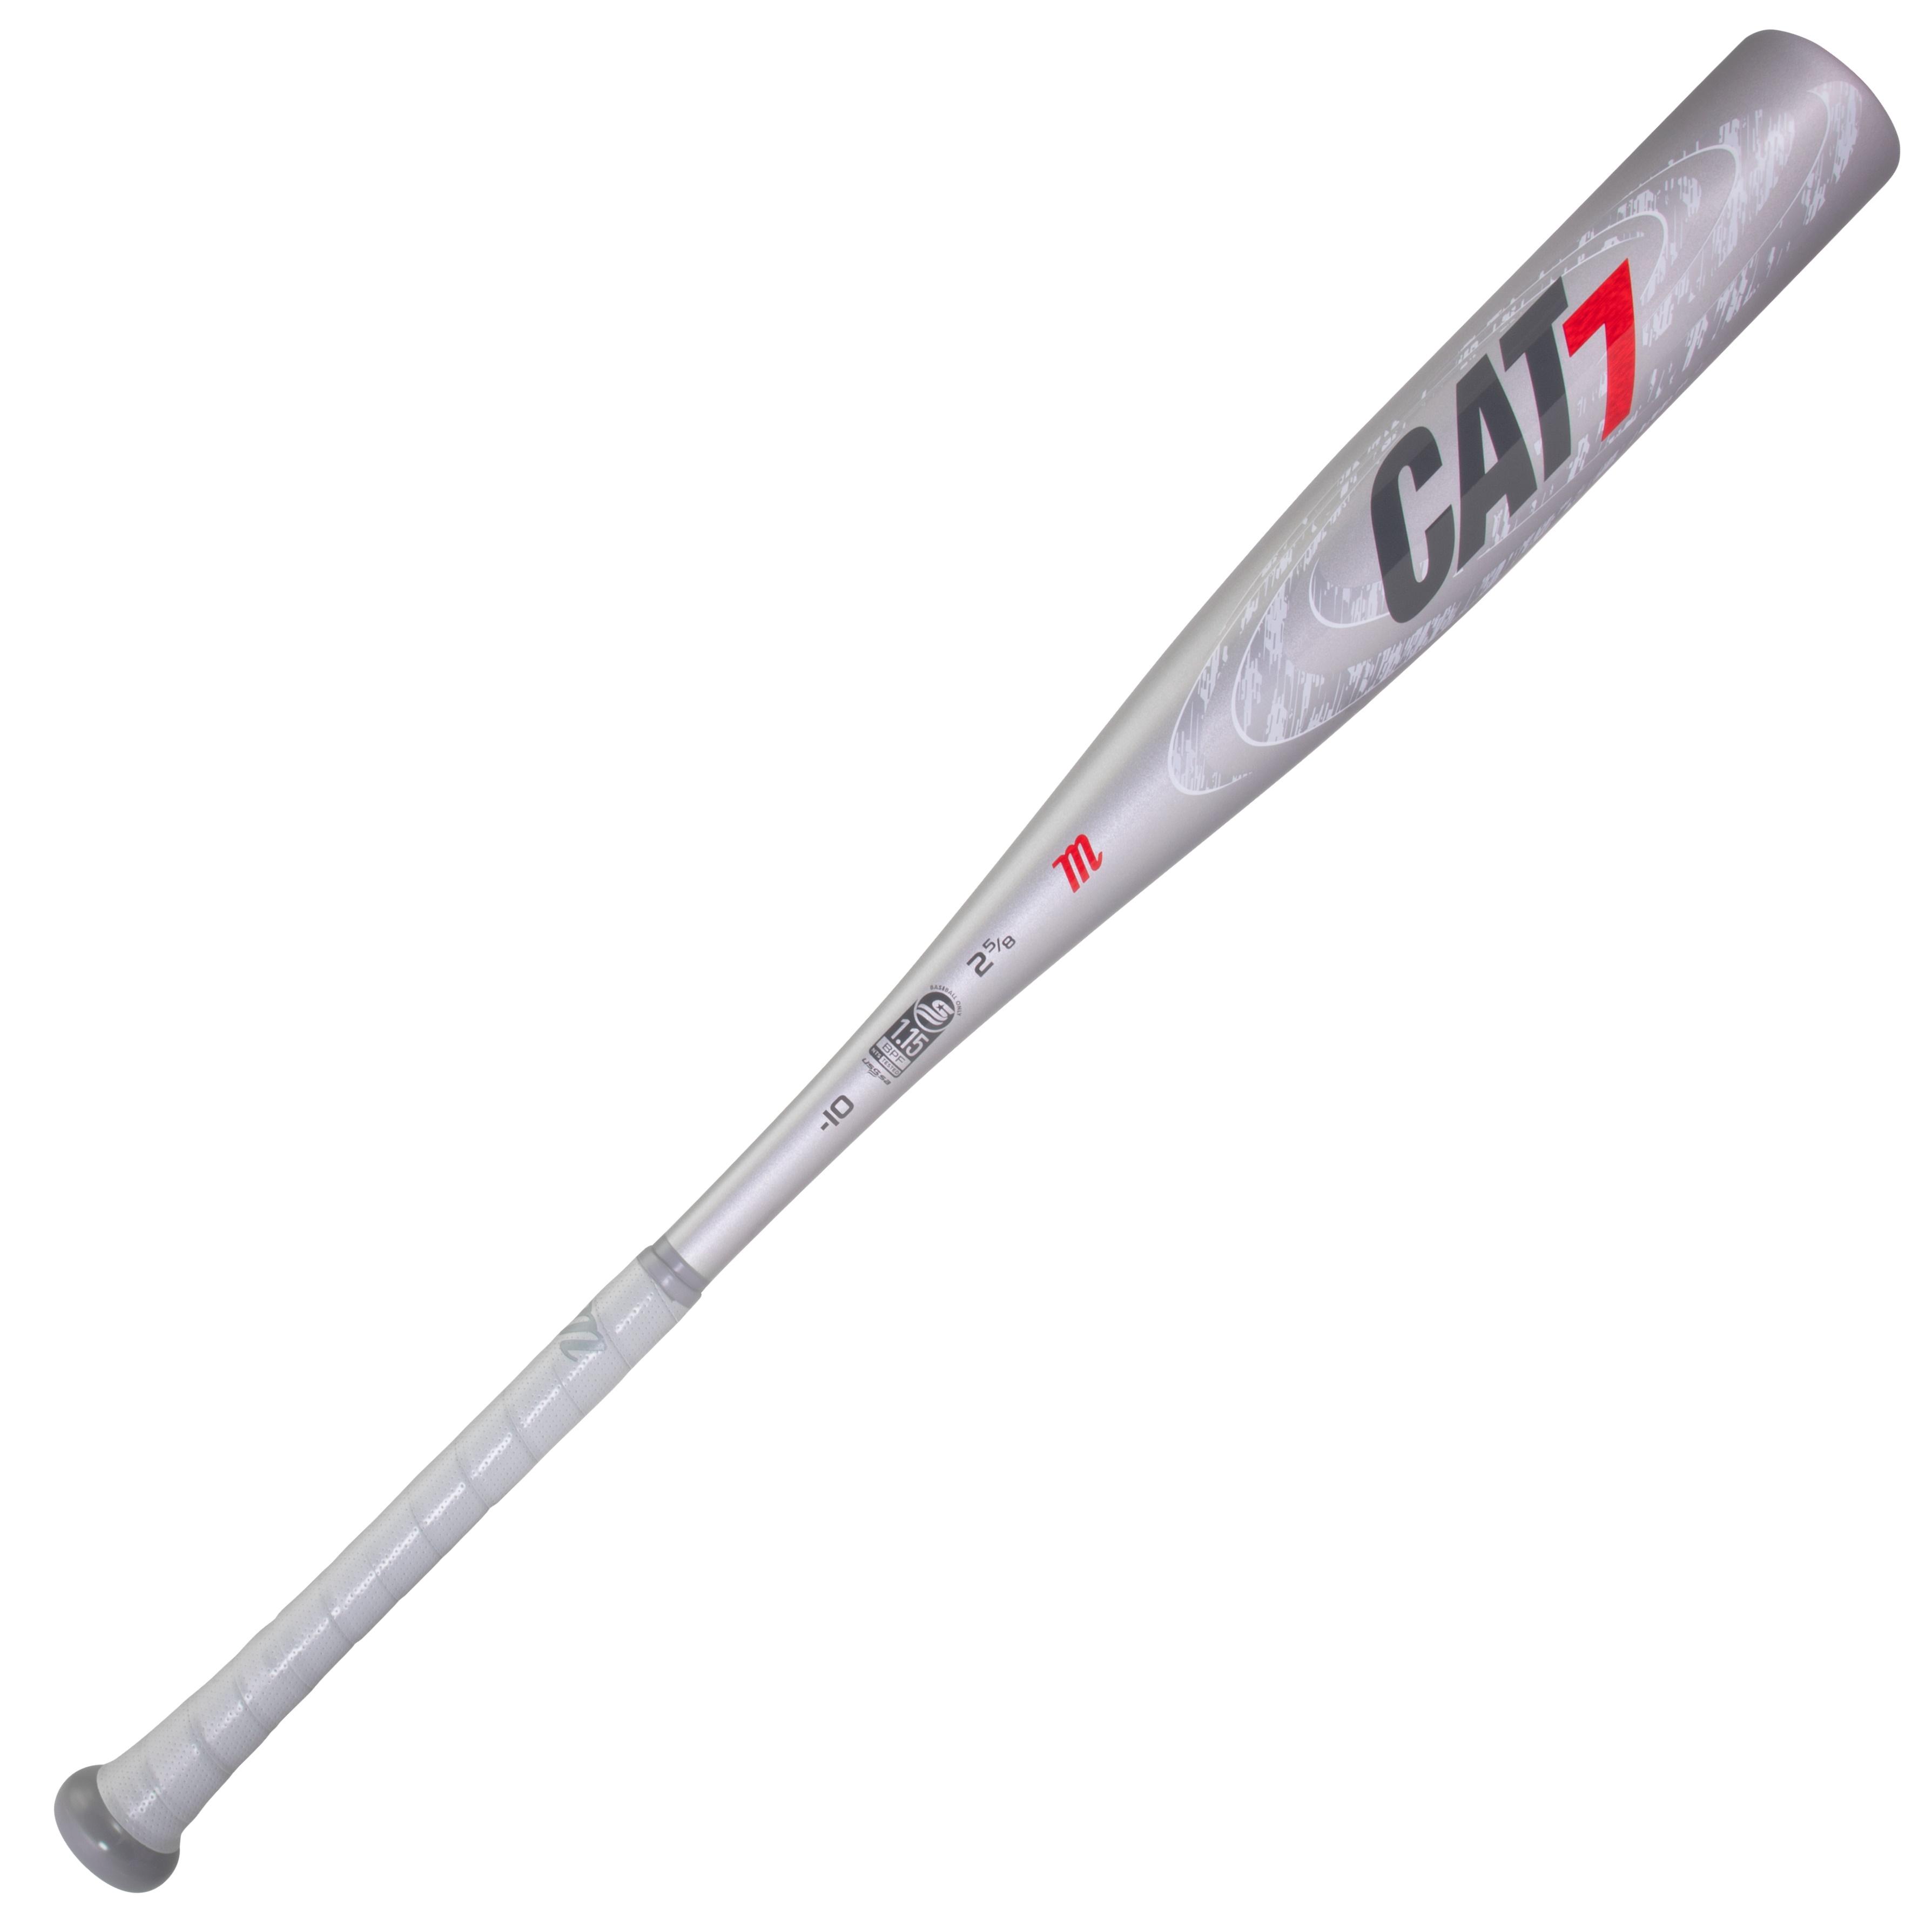 marucci-cat7-silver-10-baseball-bat-29-inch-19-oz MSBC7210S-2919 Marucci